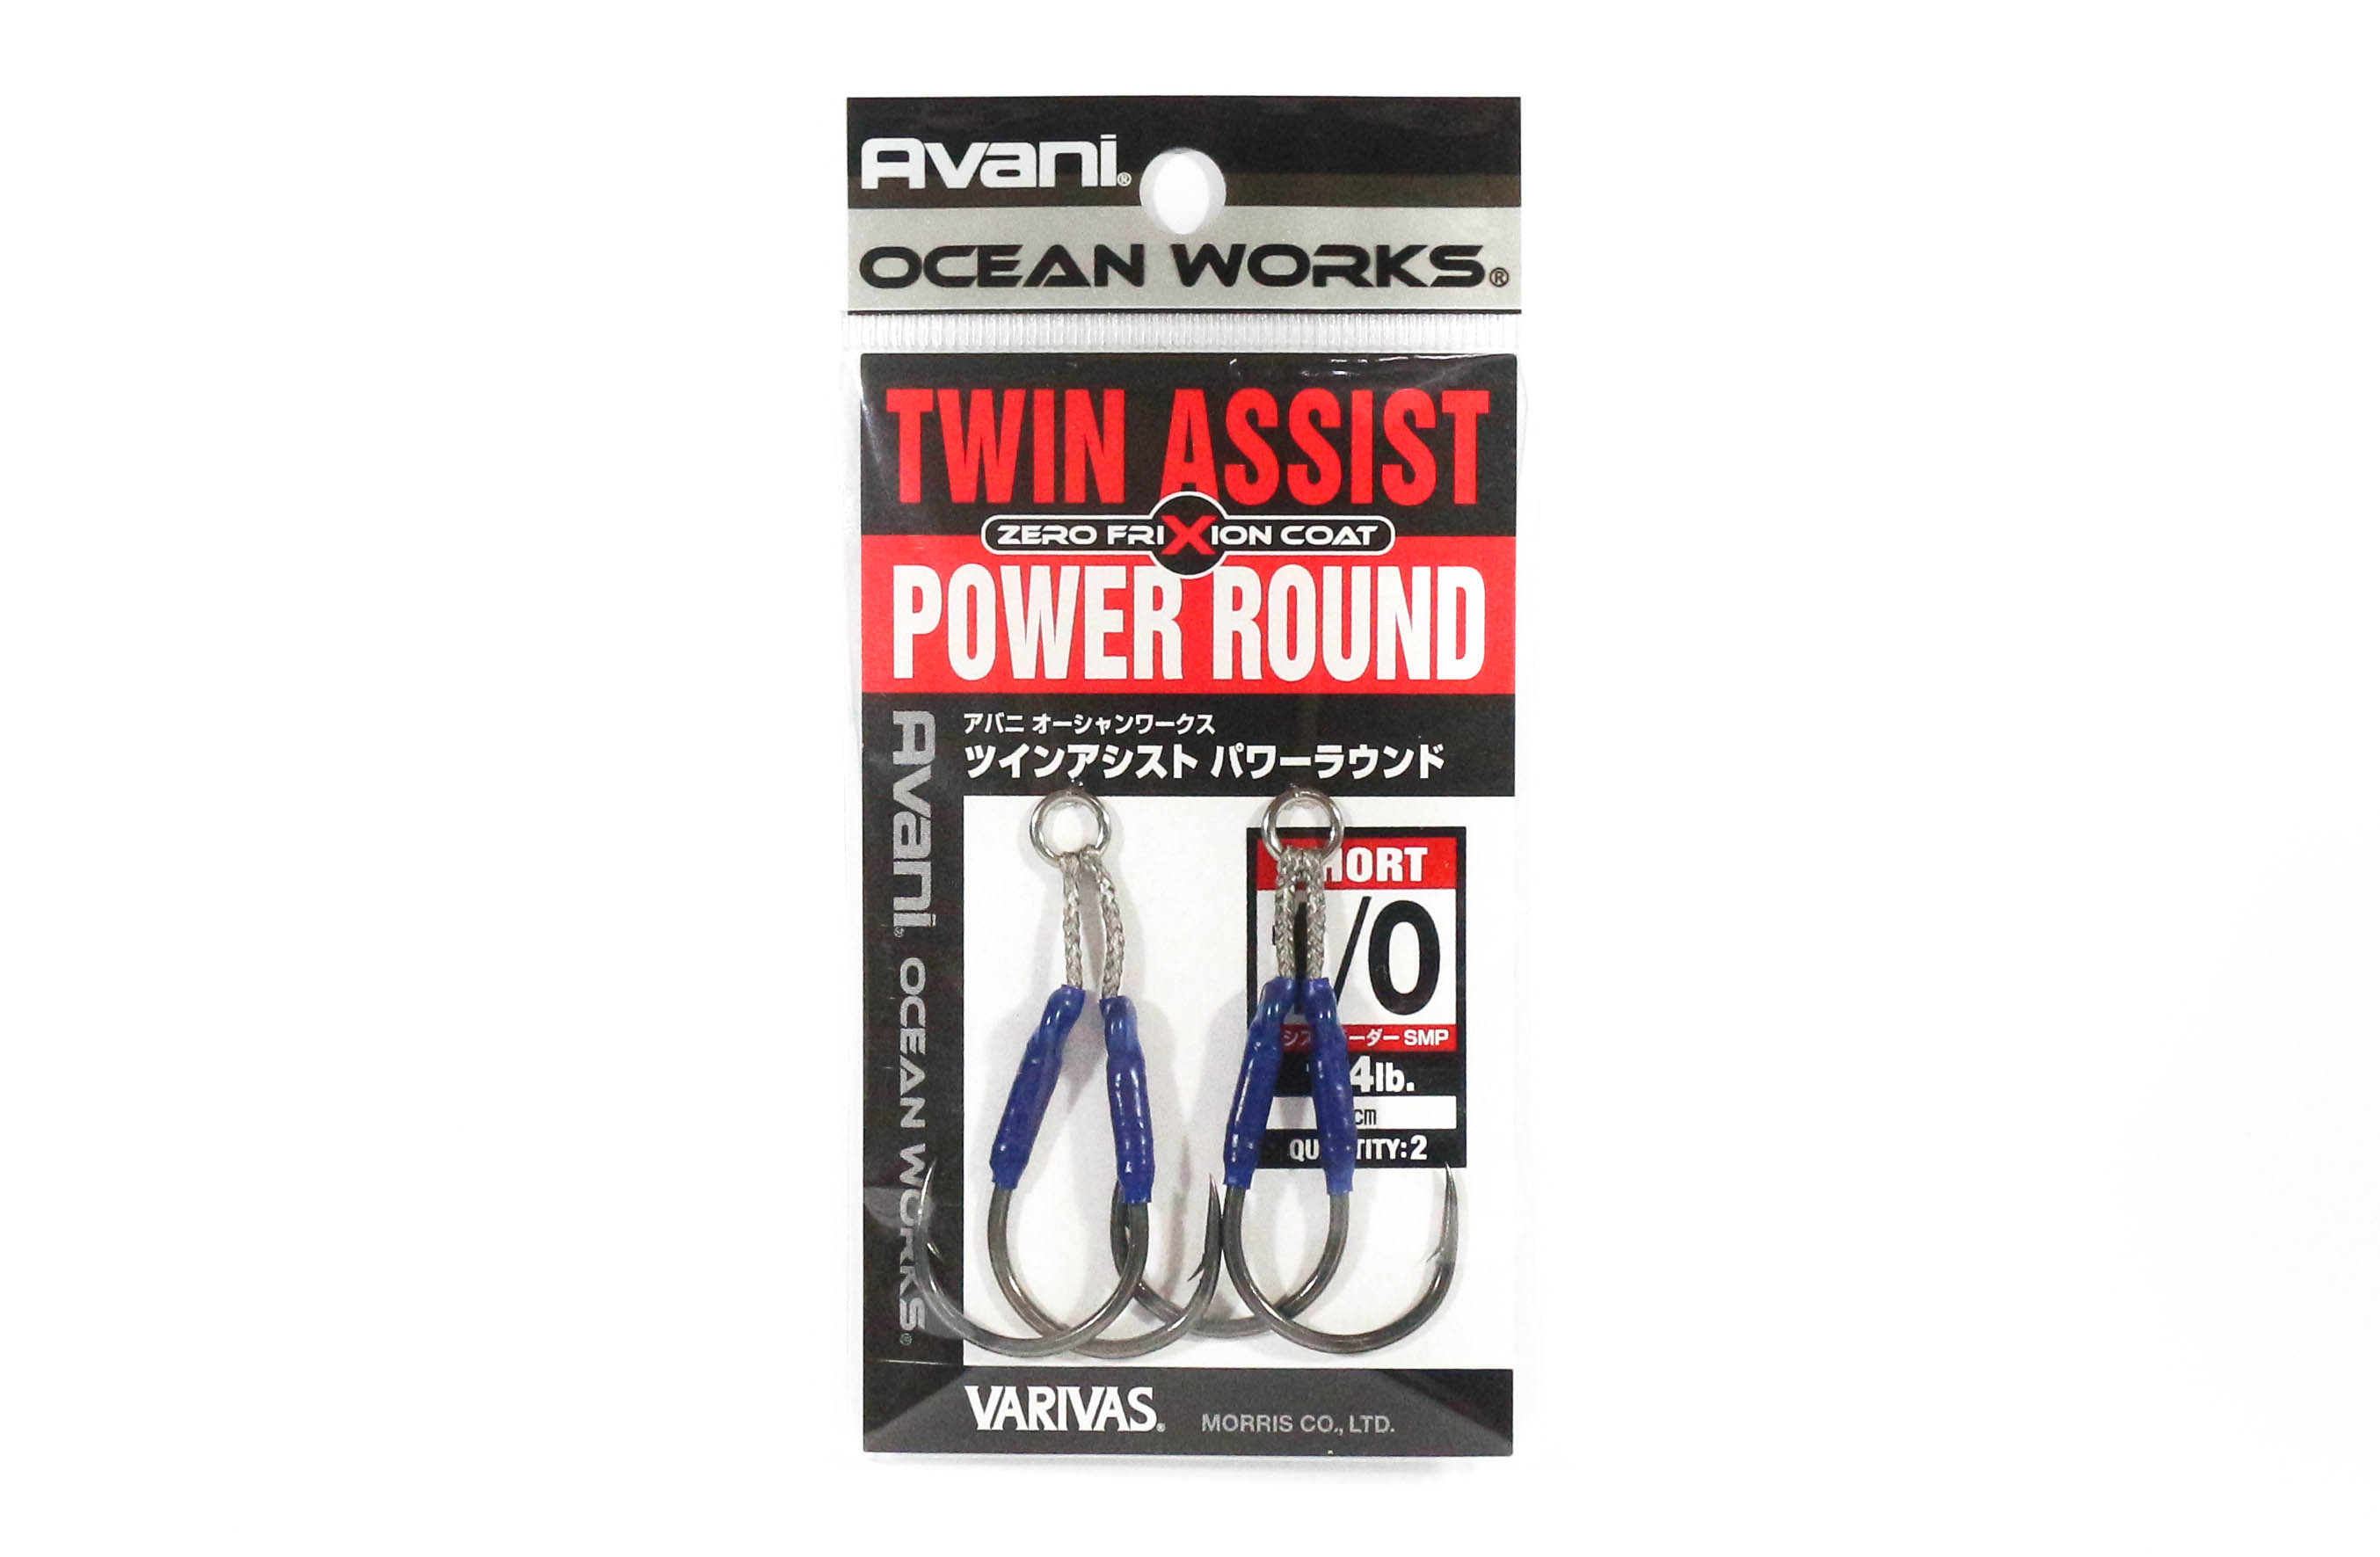 Varivas AH-48 Ocean Works Twin Assist Power Round Short Size 1/0 (4414)